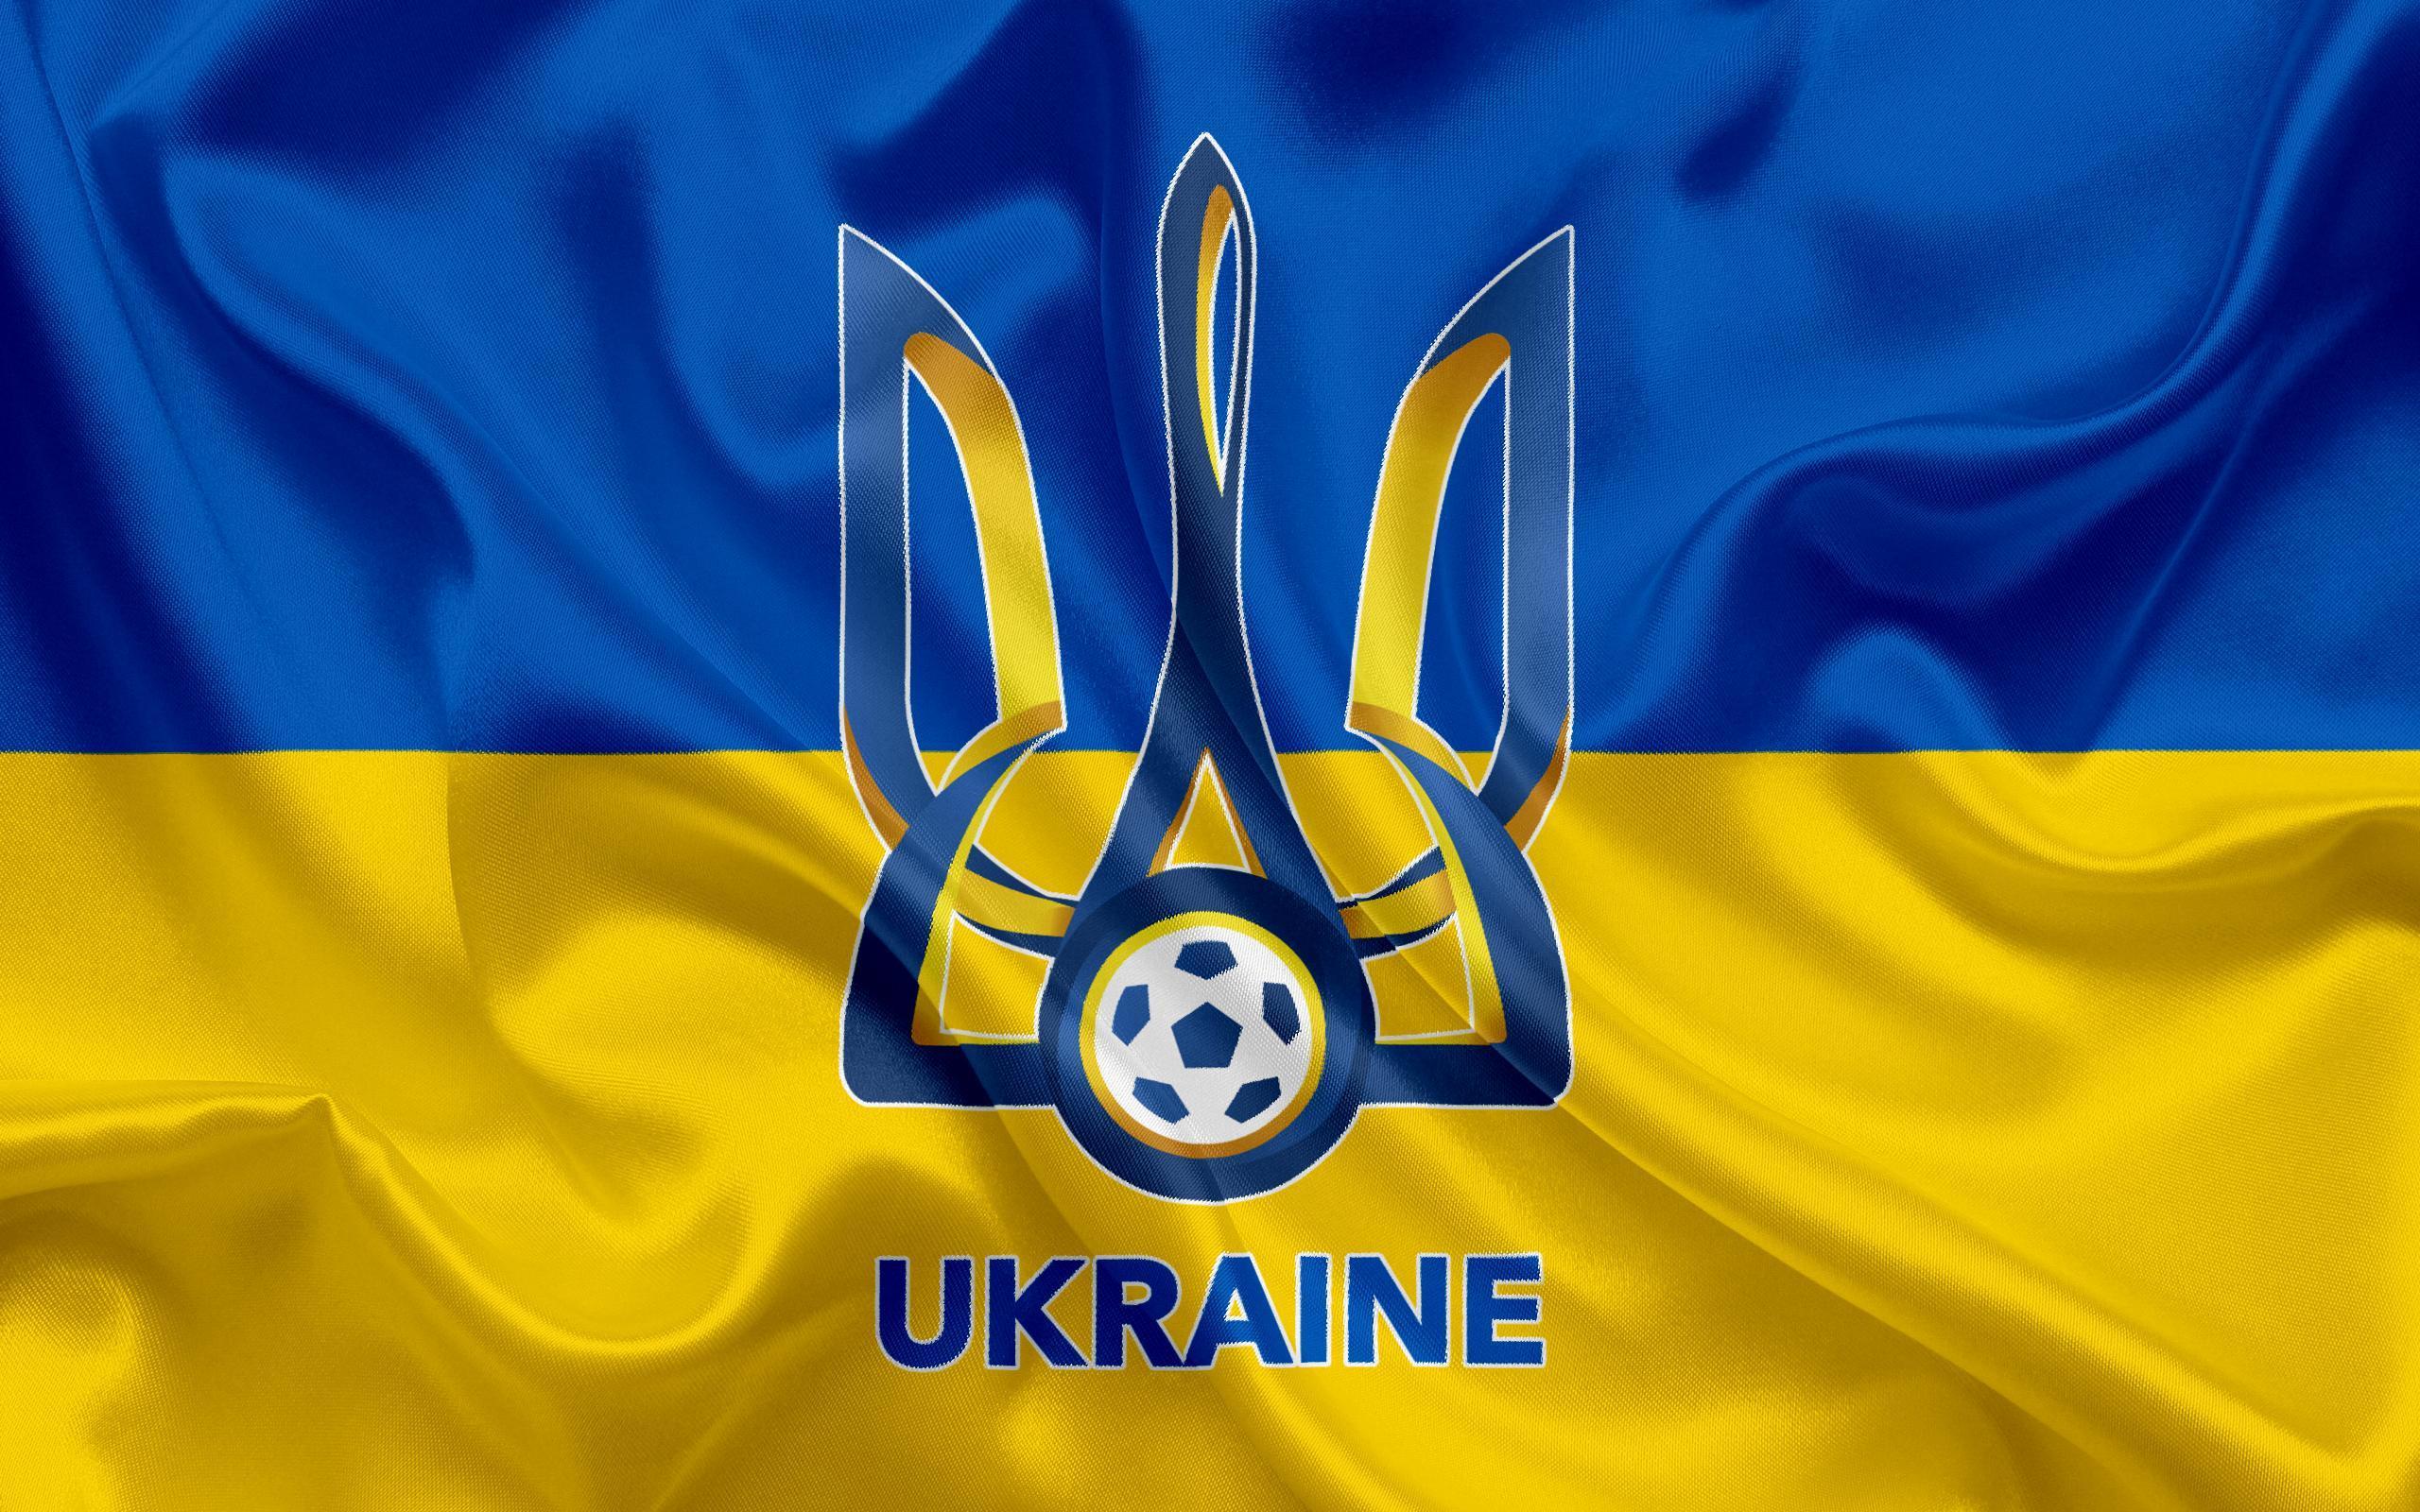 Ukraine National Football Team Background 7